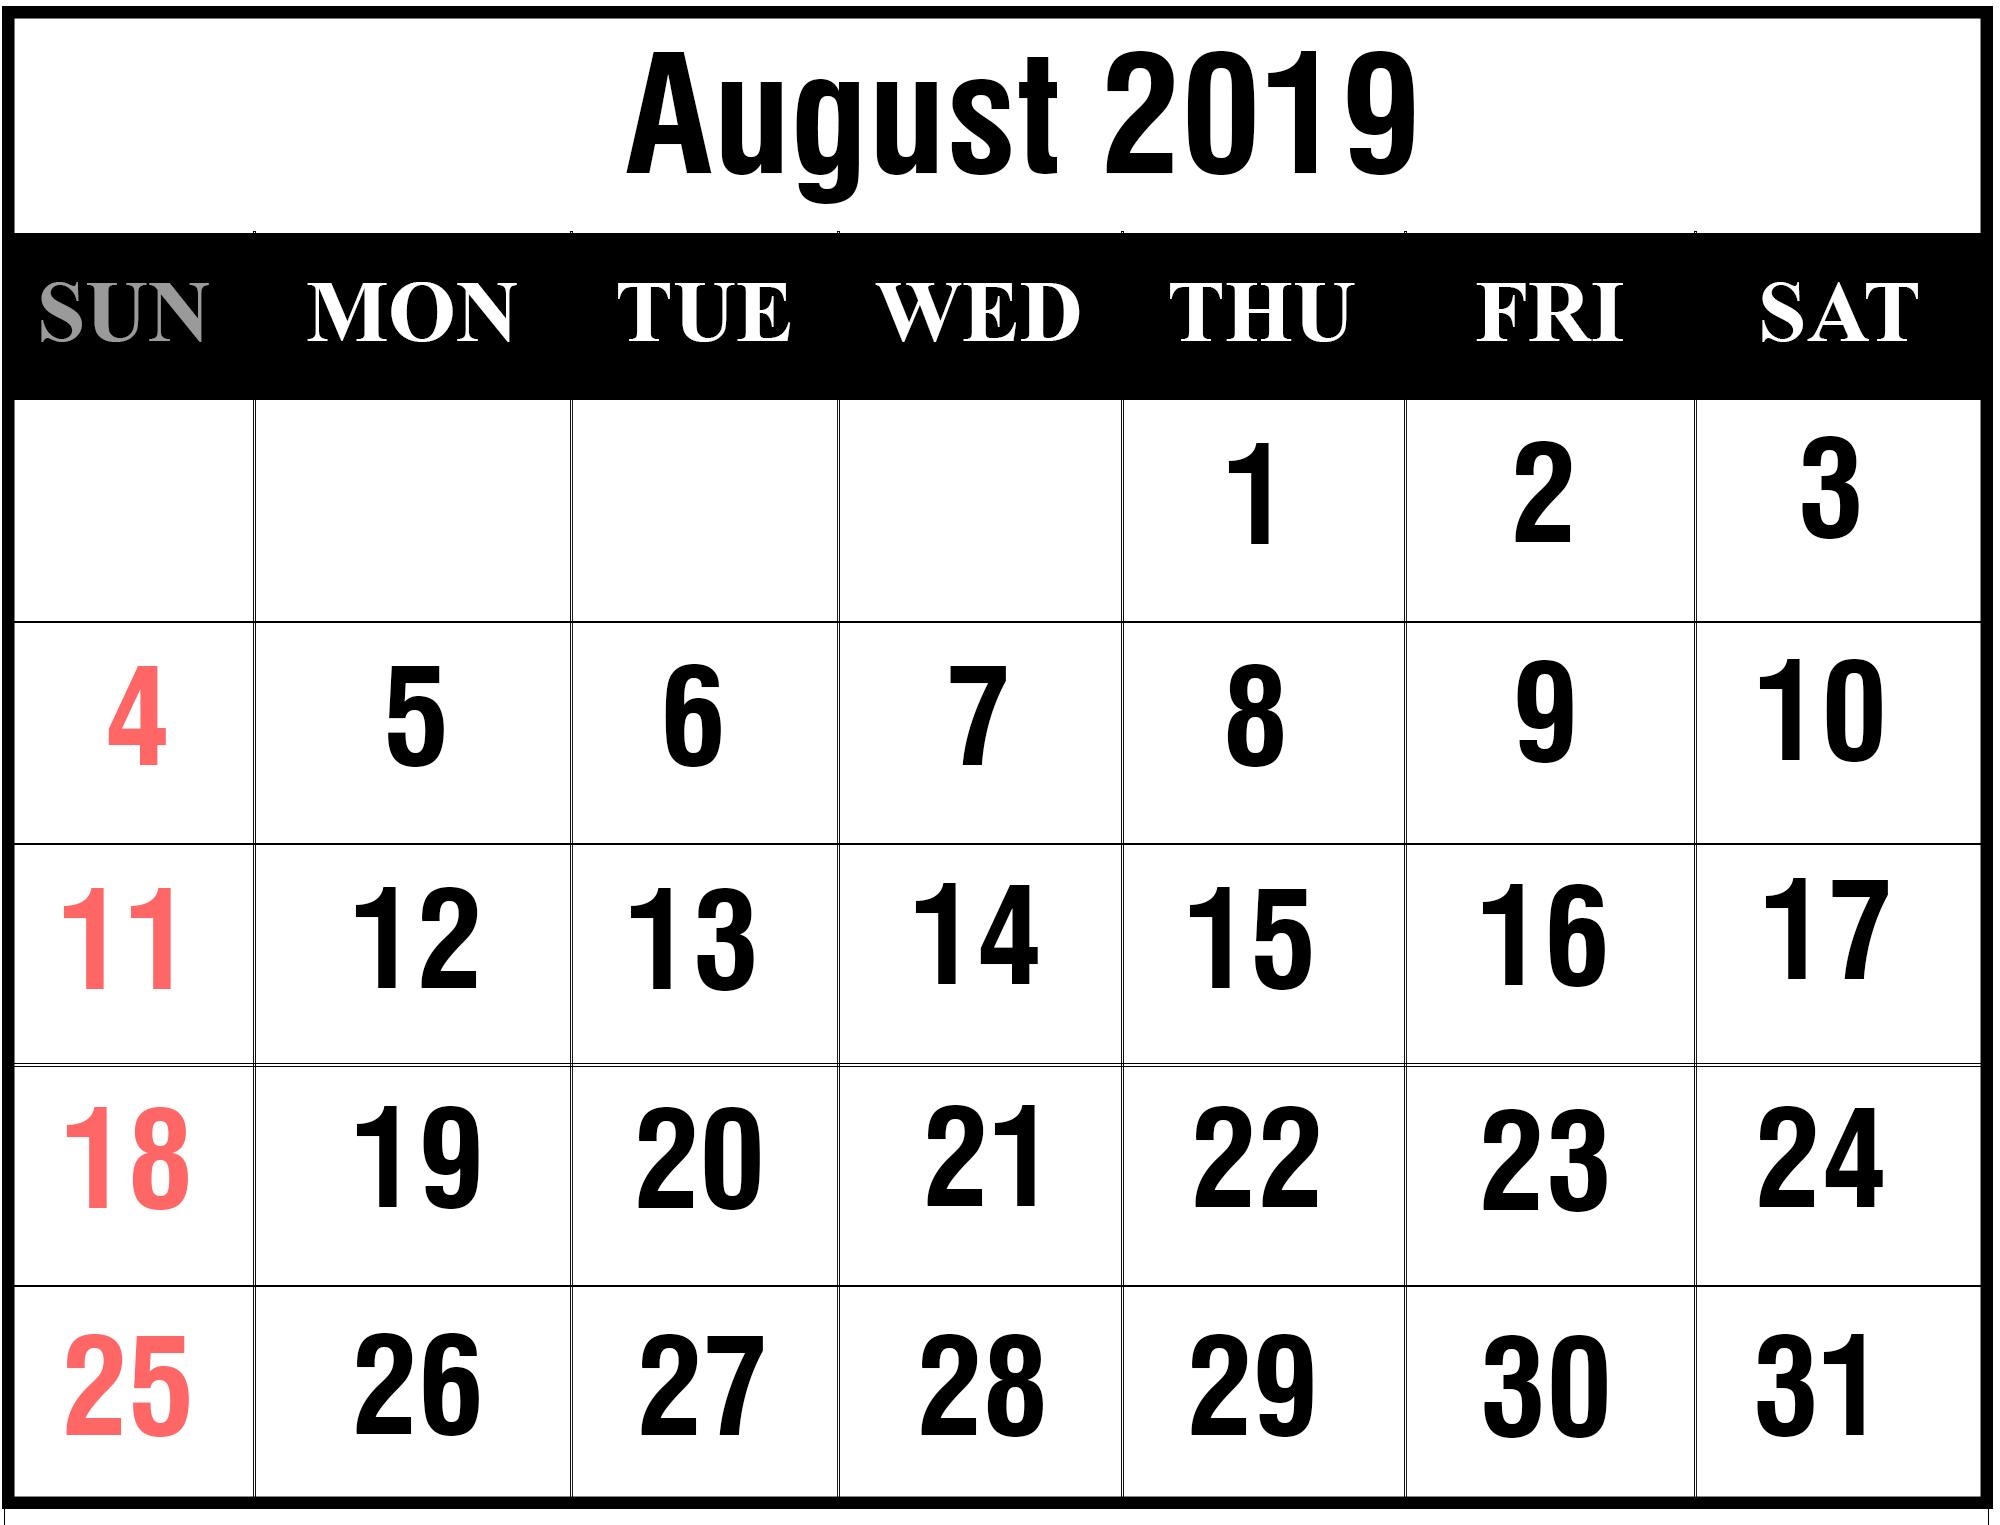 Free August 2019 Printable Calendar Template In Pdf, Excel, Word regarding August Calendar Template Excel